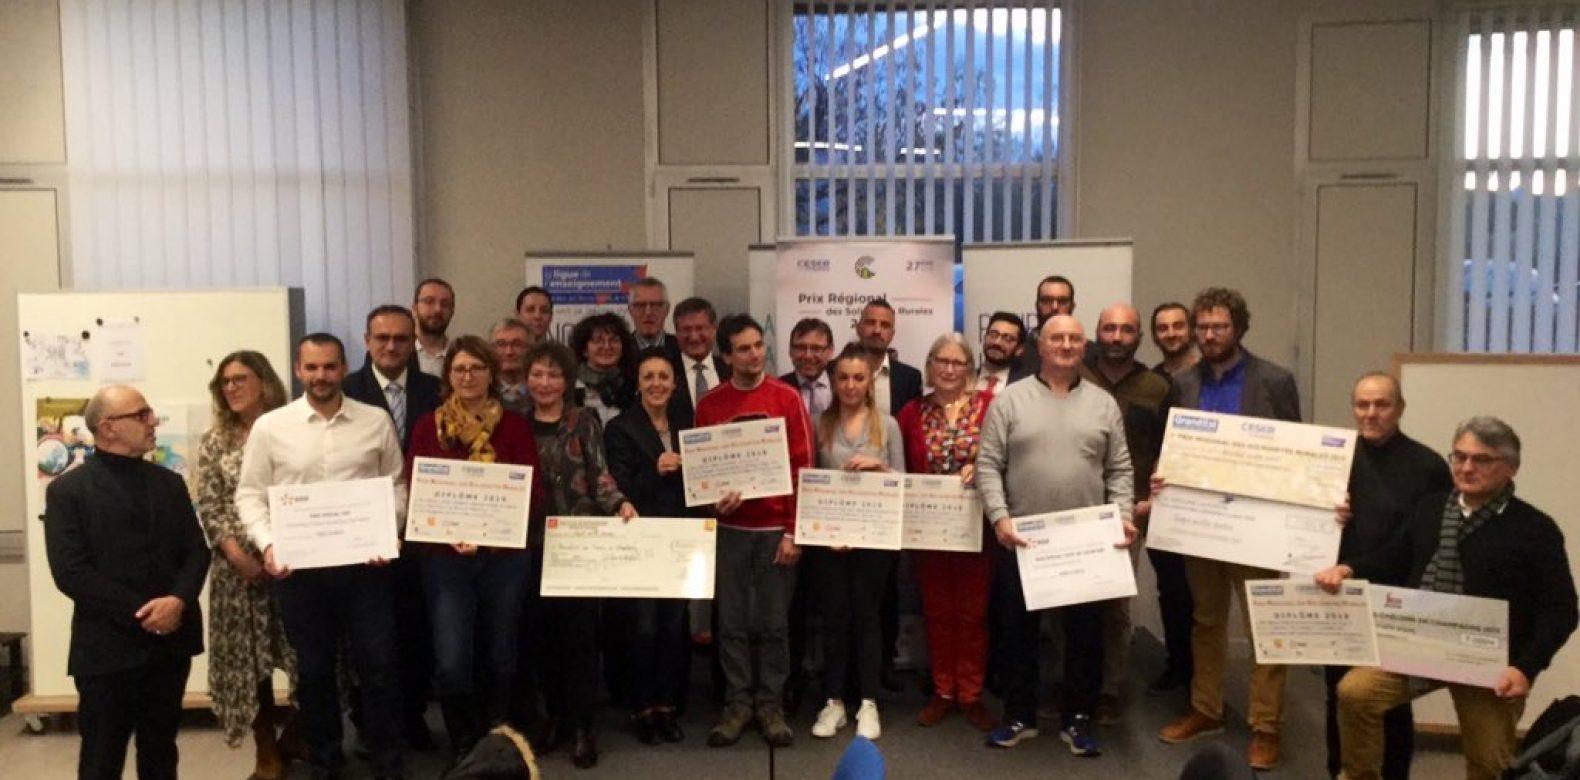 Prix Régional des Solidarités Rurales 2019 | Le Palmarès !